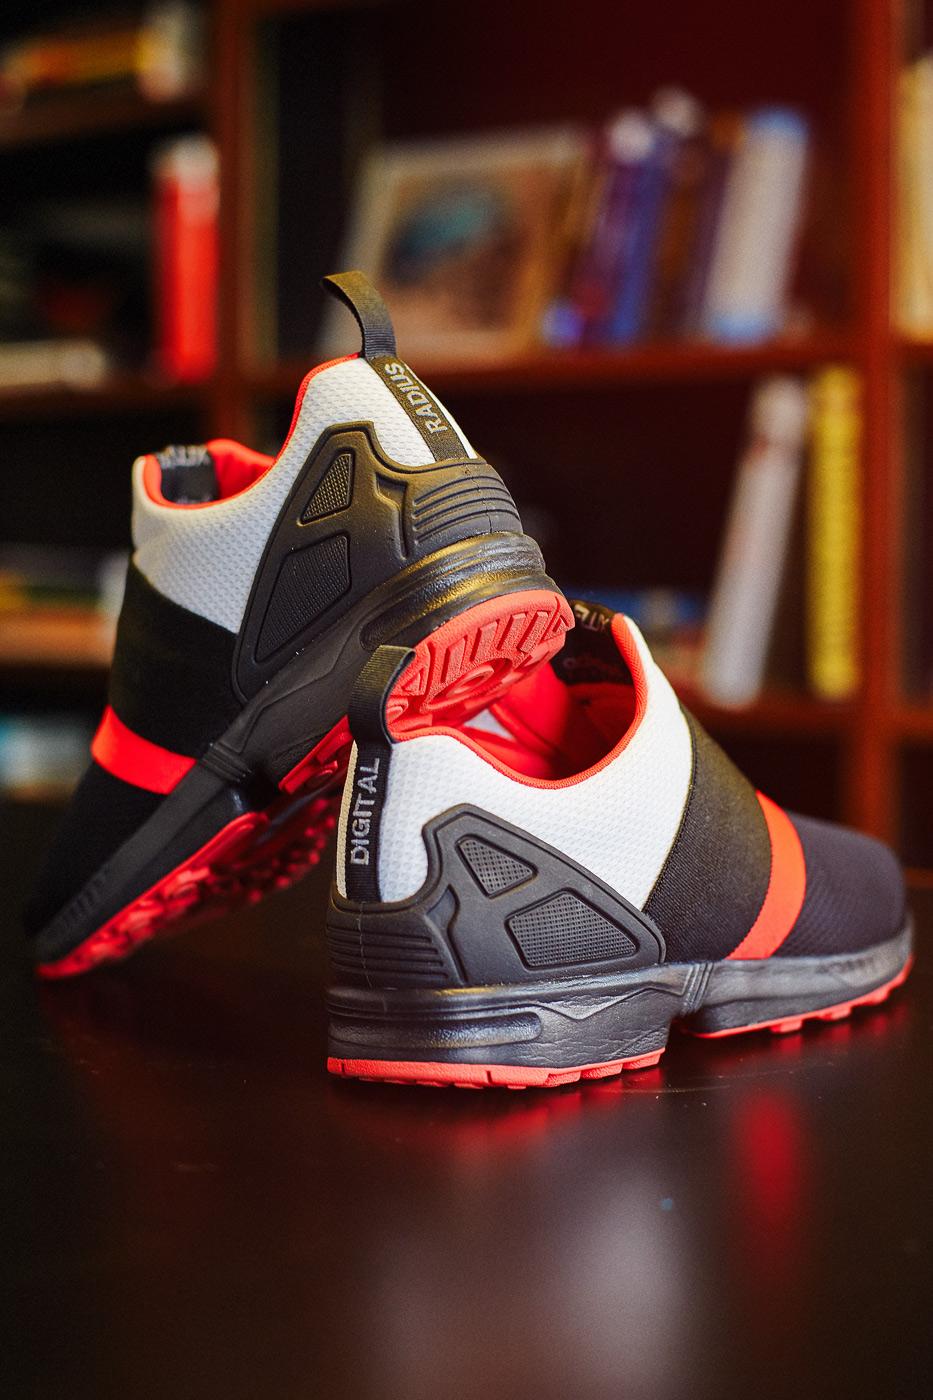 Radius Digital Shoes